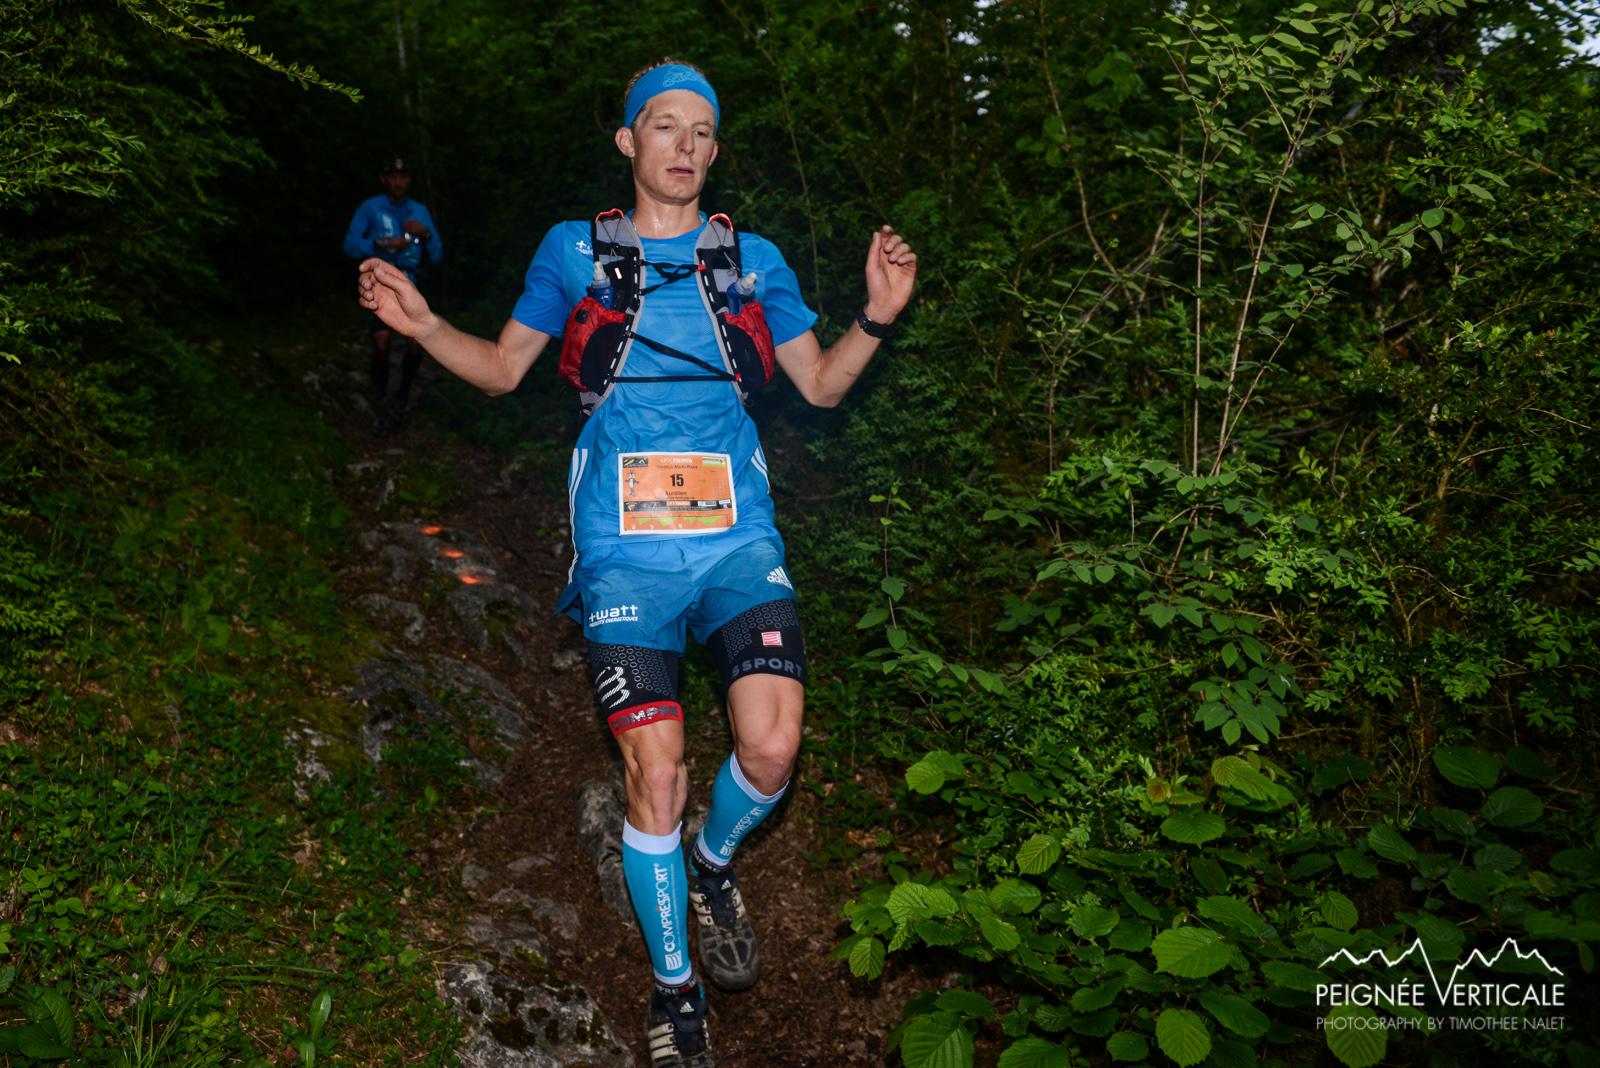 MaxiRace-Annecy-2014-Team-Hoka-Timothee-Nalet-0816.jpg